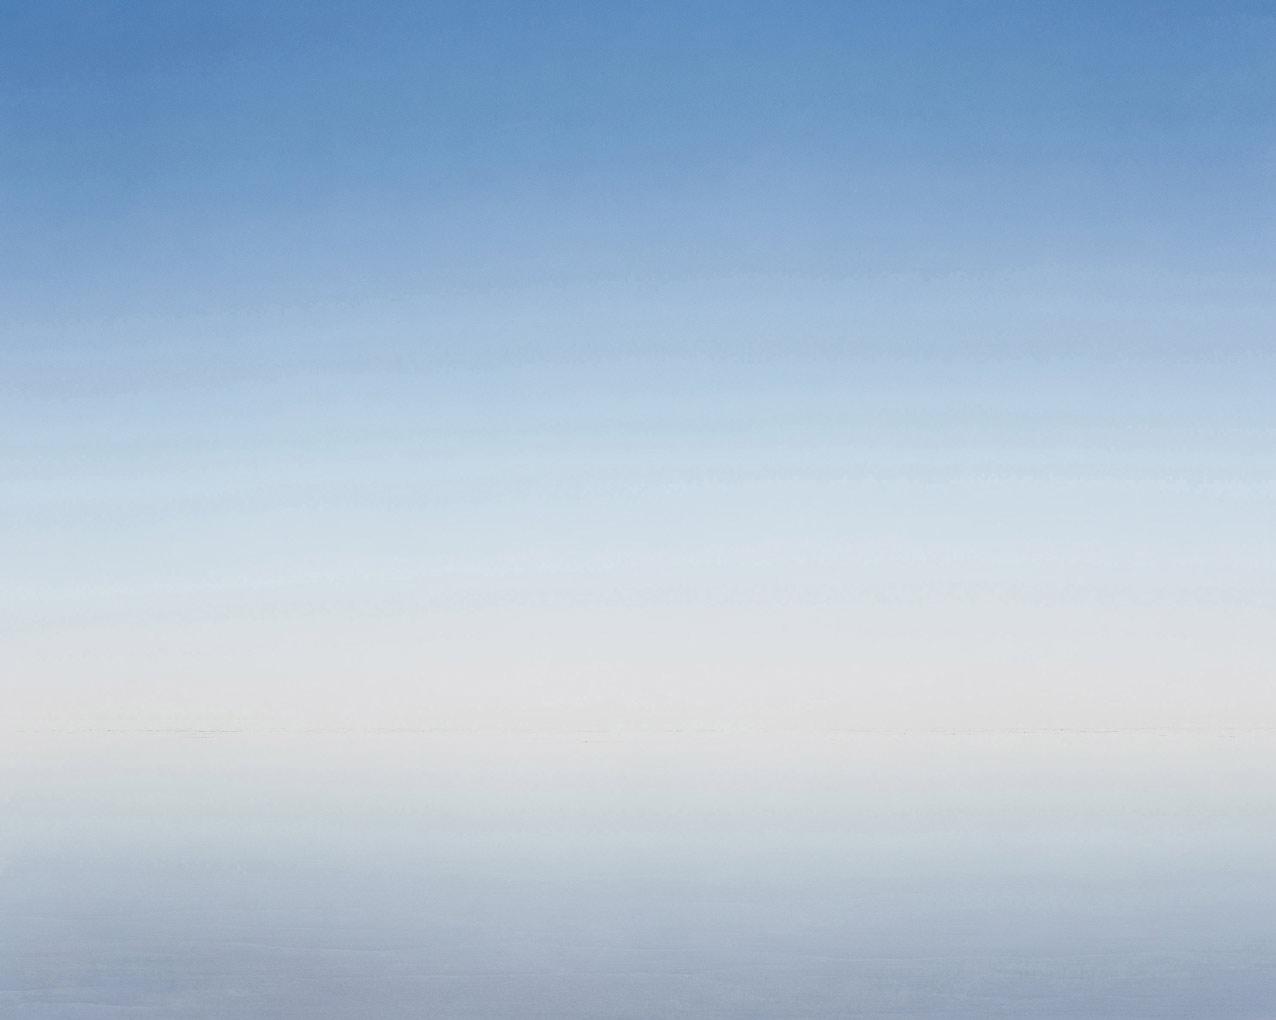 Salt 129, 120cm x 150cm, digital pigment print on cotton rag, edition of 7, 2006